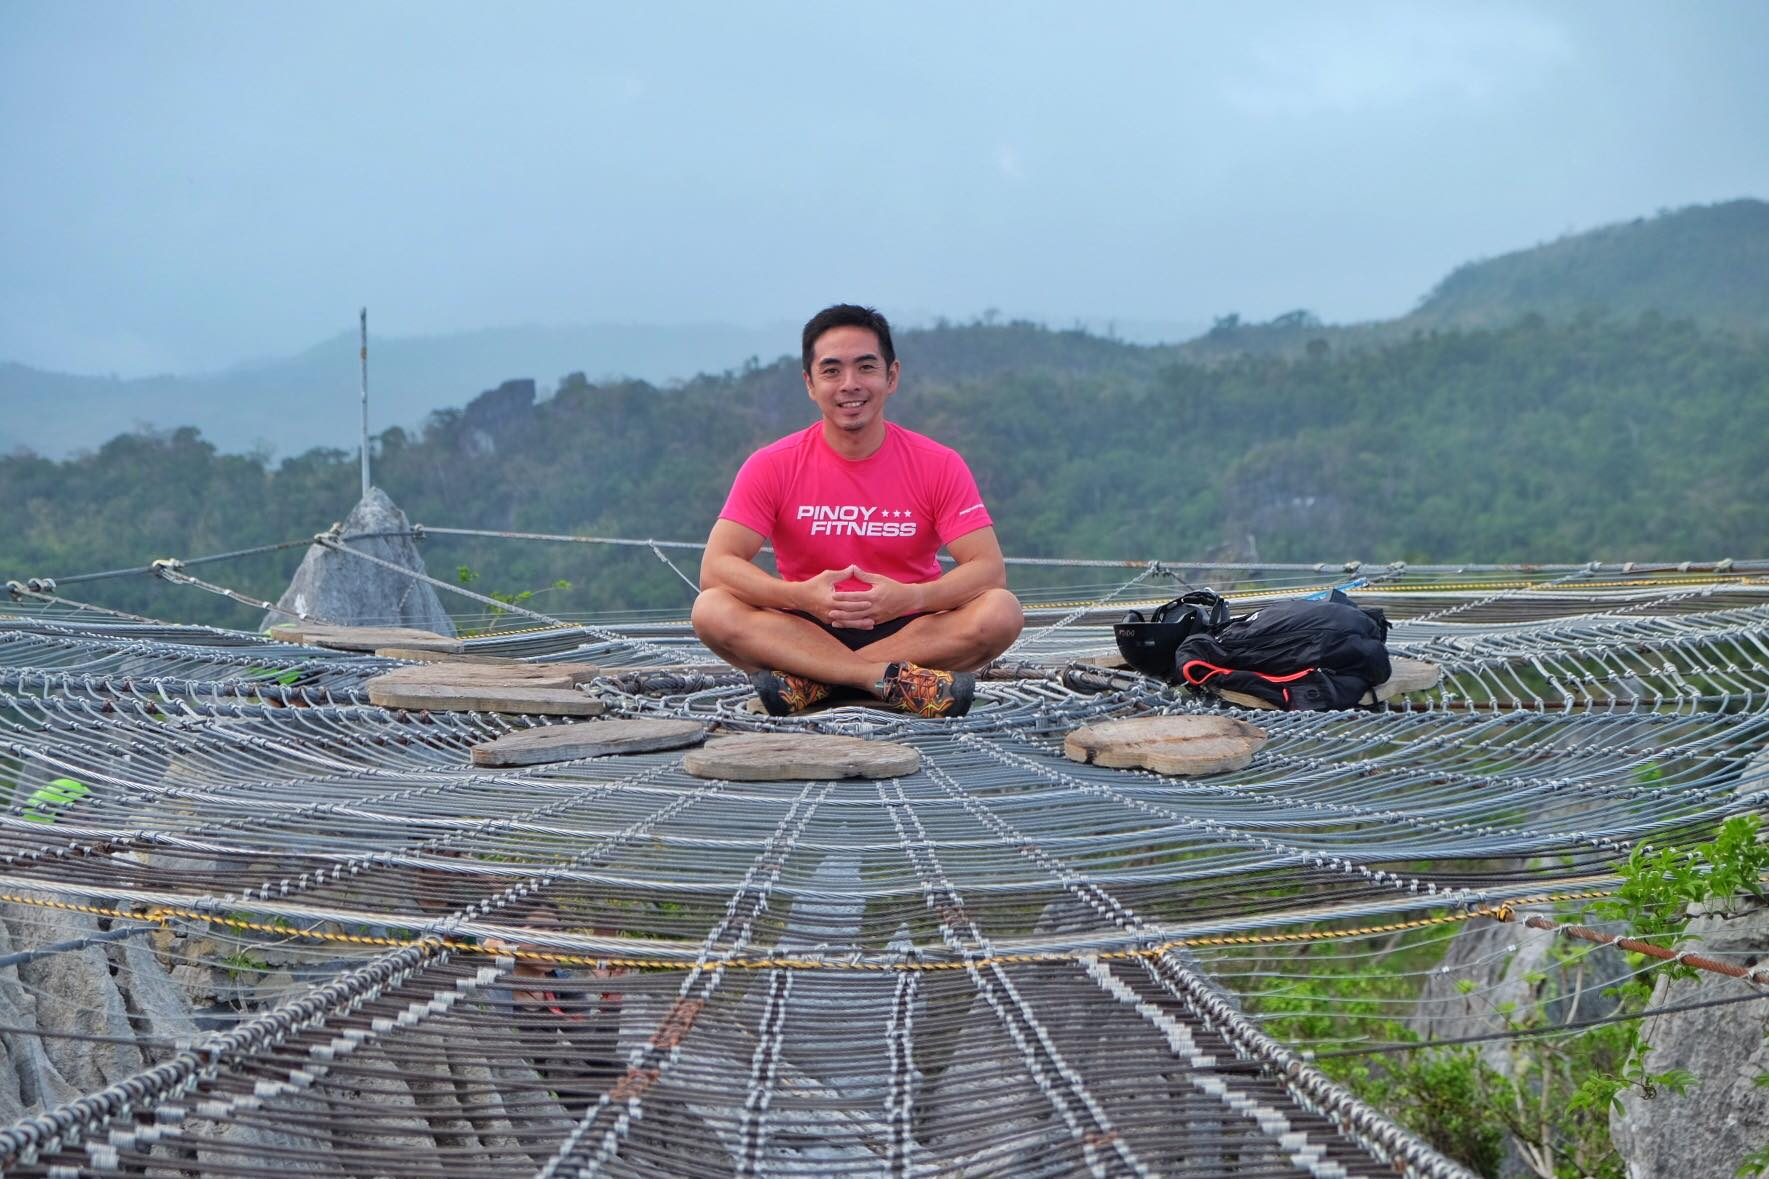 Masungi Georeserve Trail Rizal 1 Pinoy Fitness St 480 Wiring Diagram